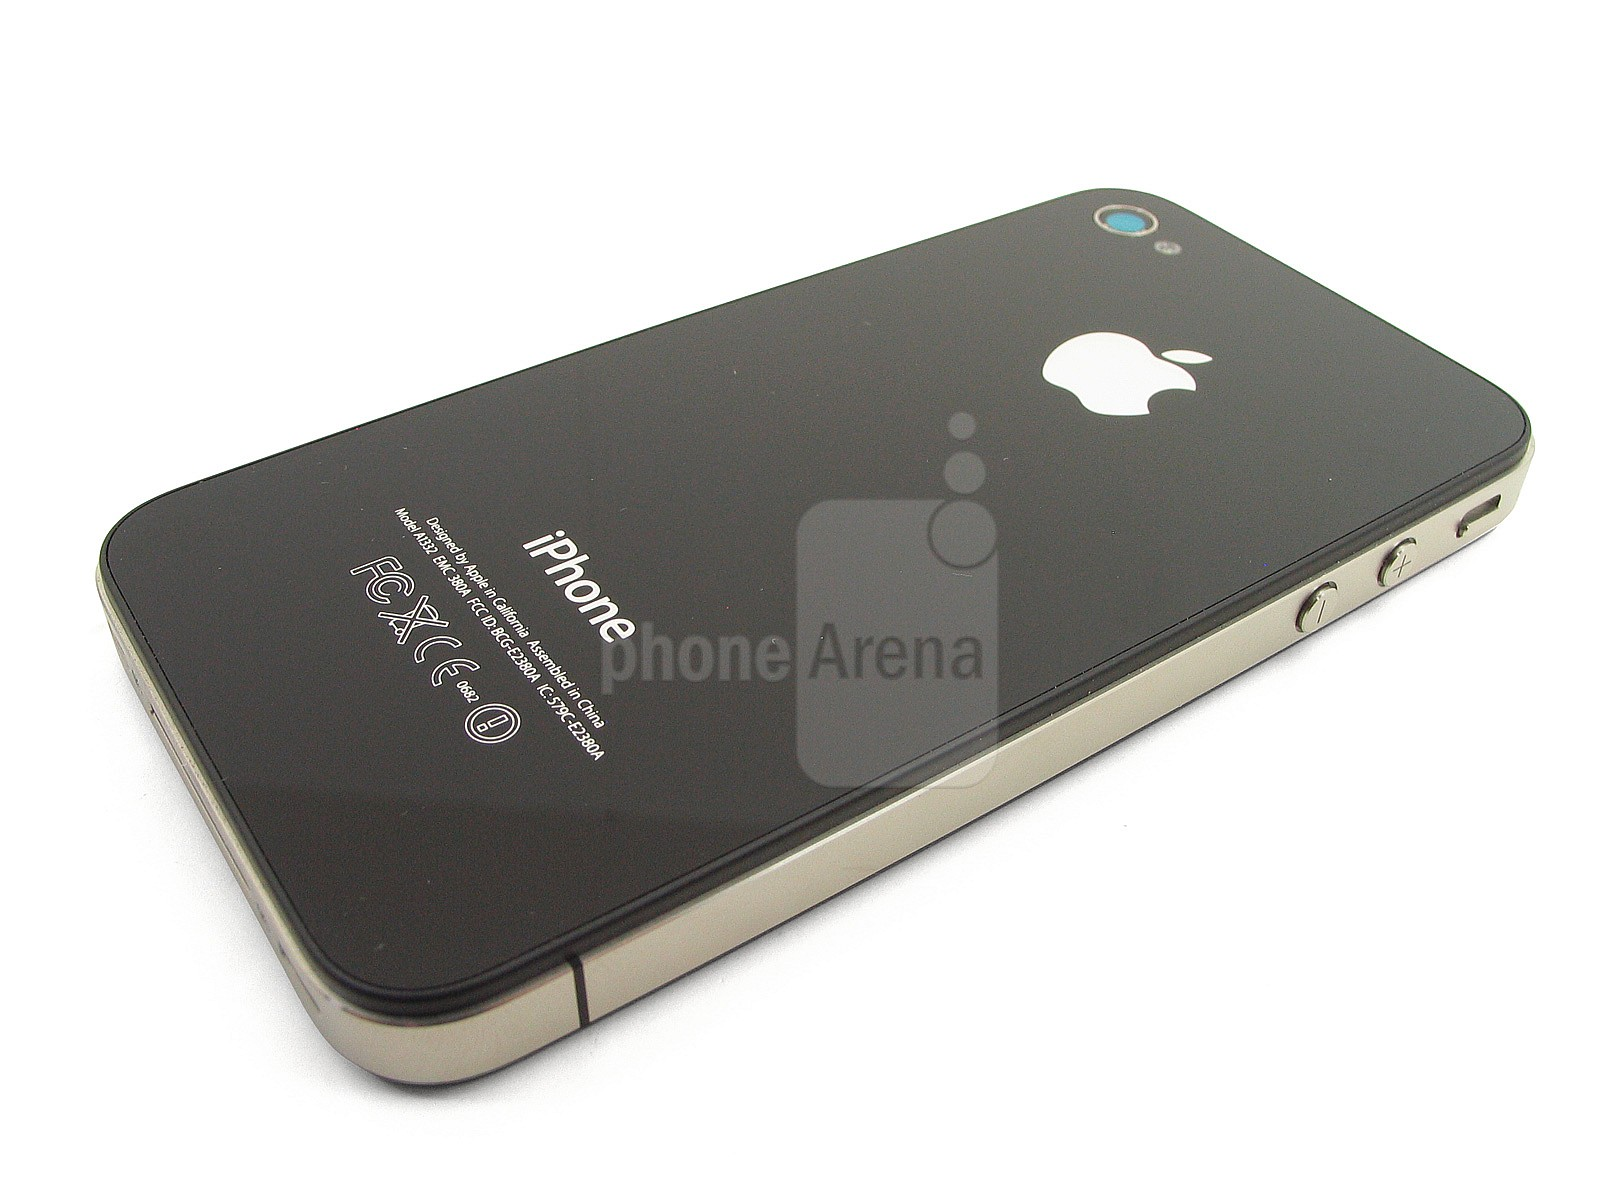 Apple iPhone 4 9